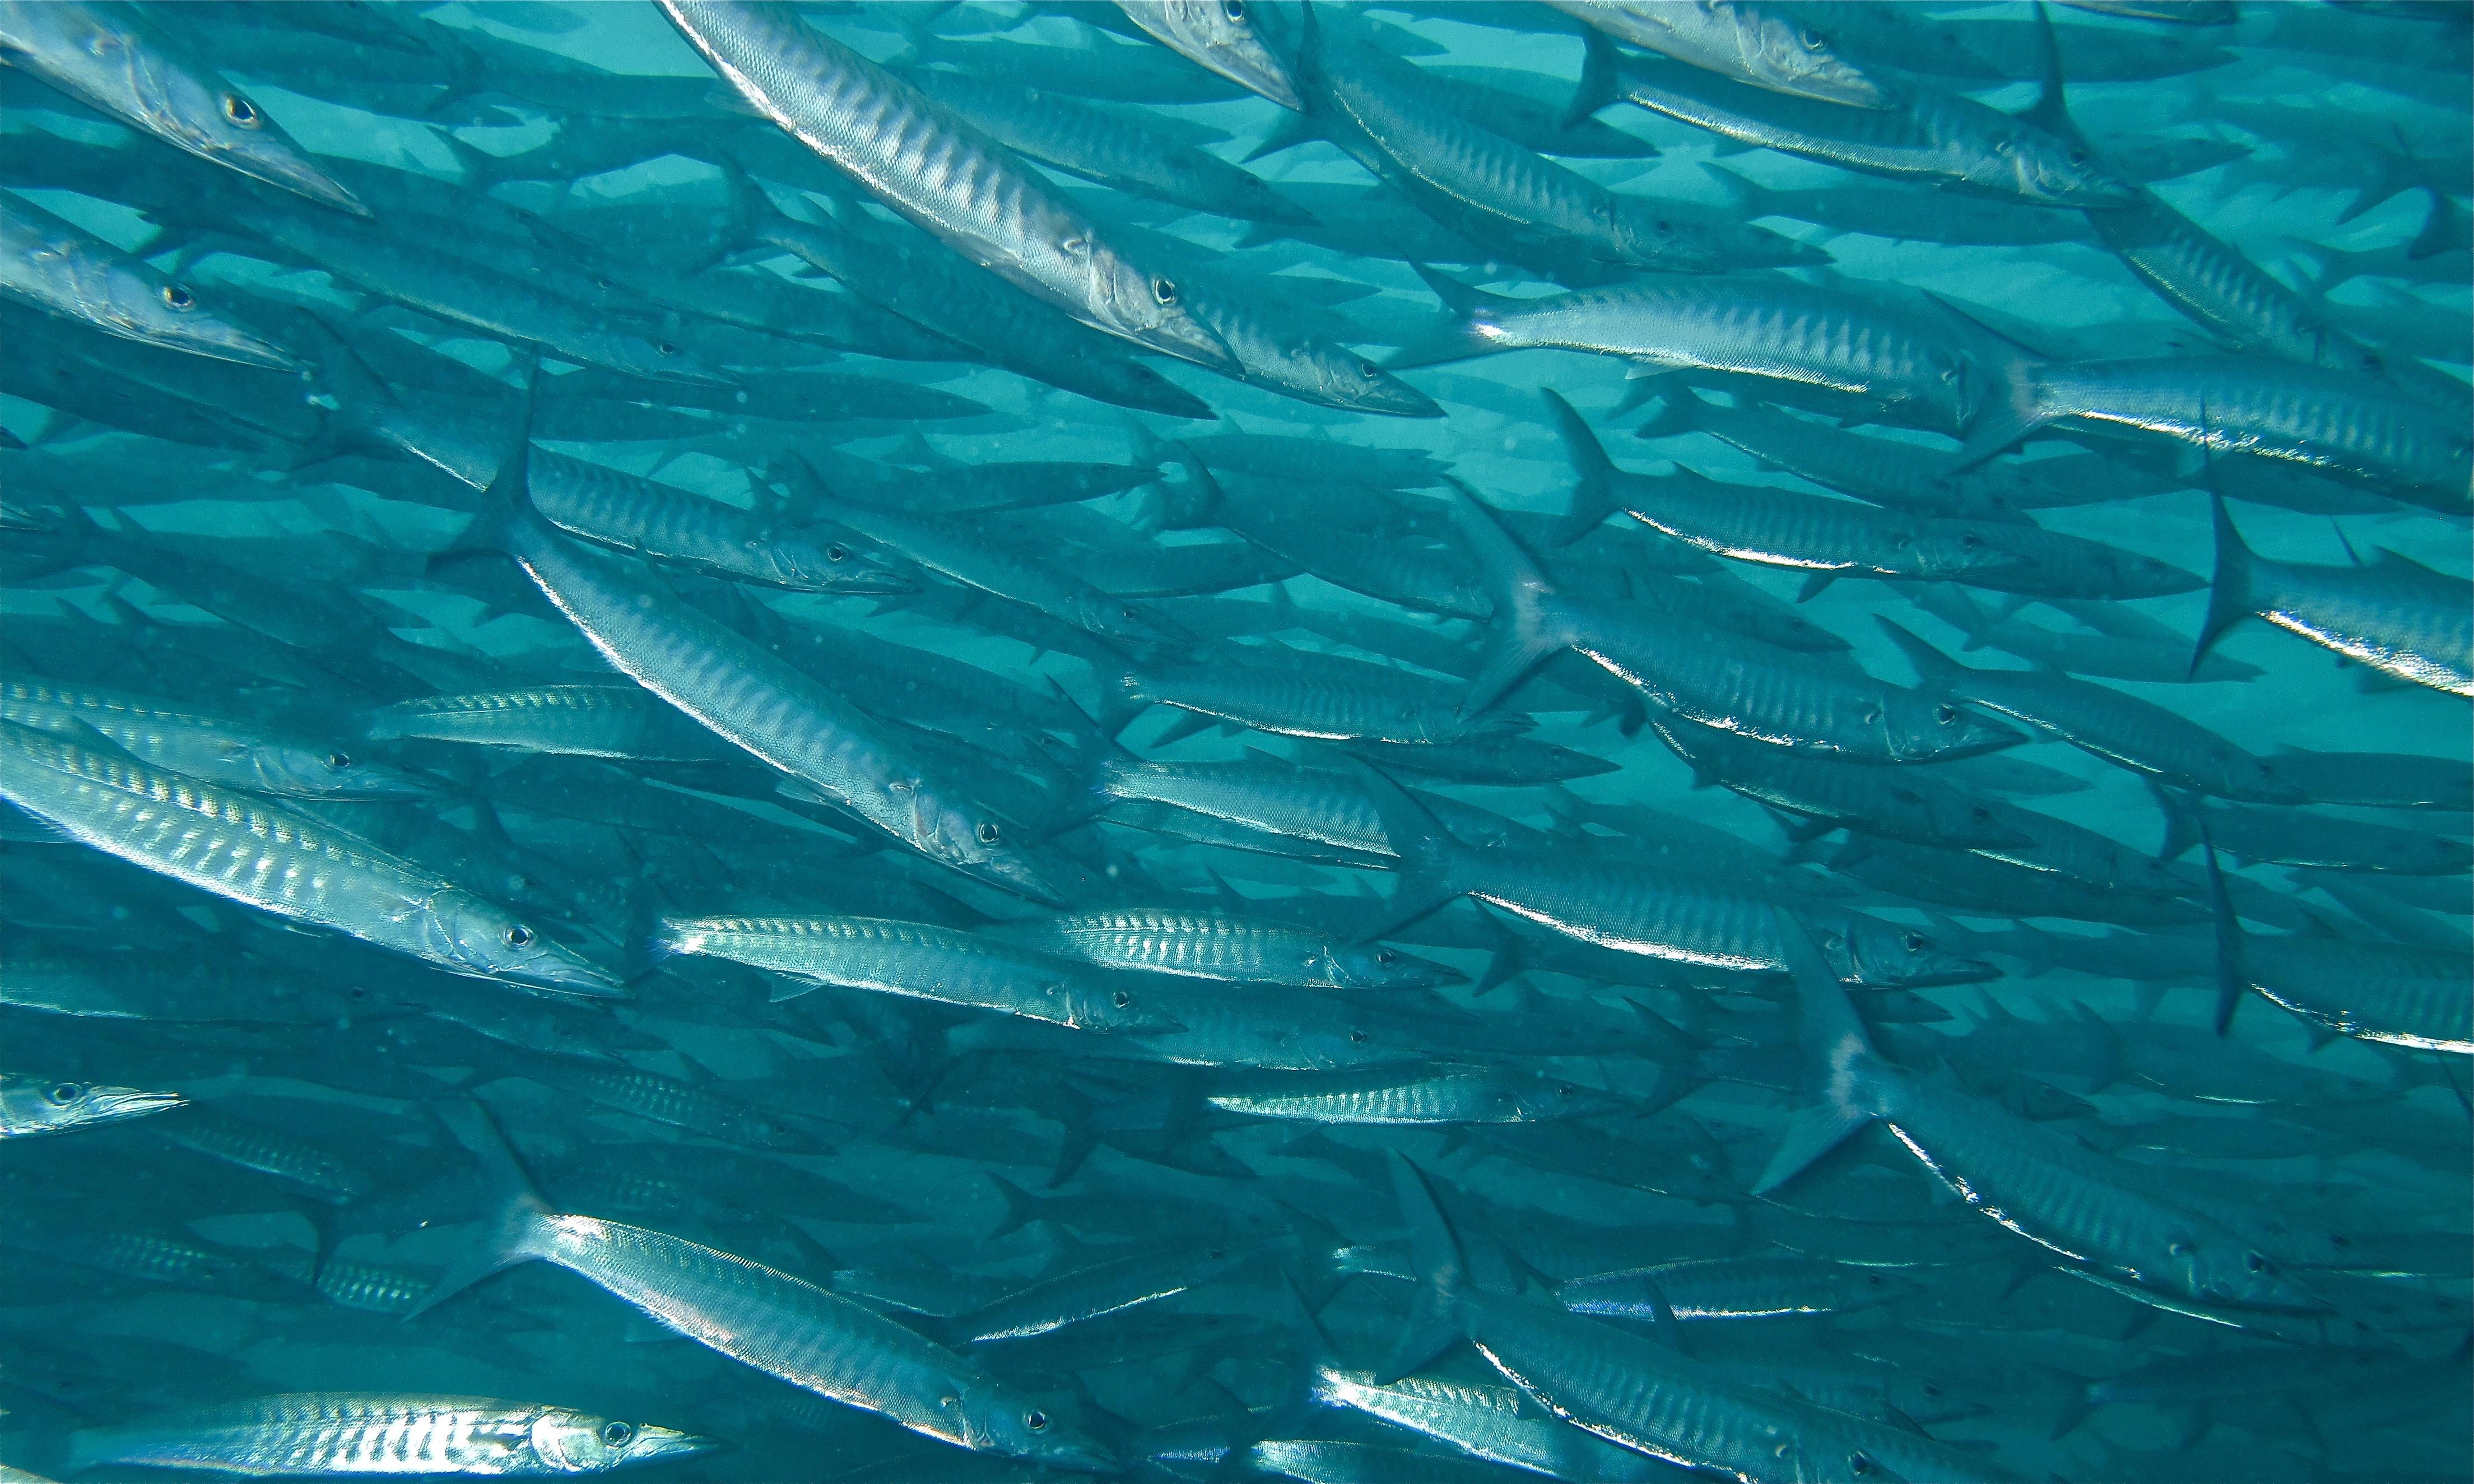 Image of Blackfin barracuda